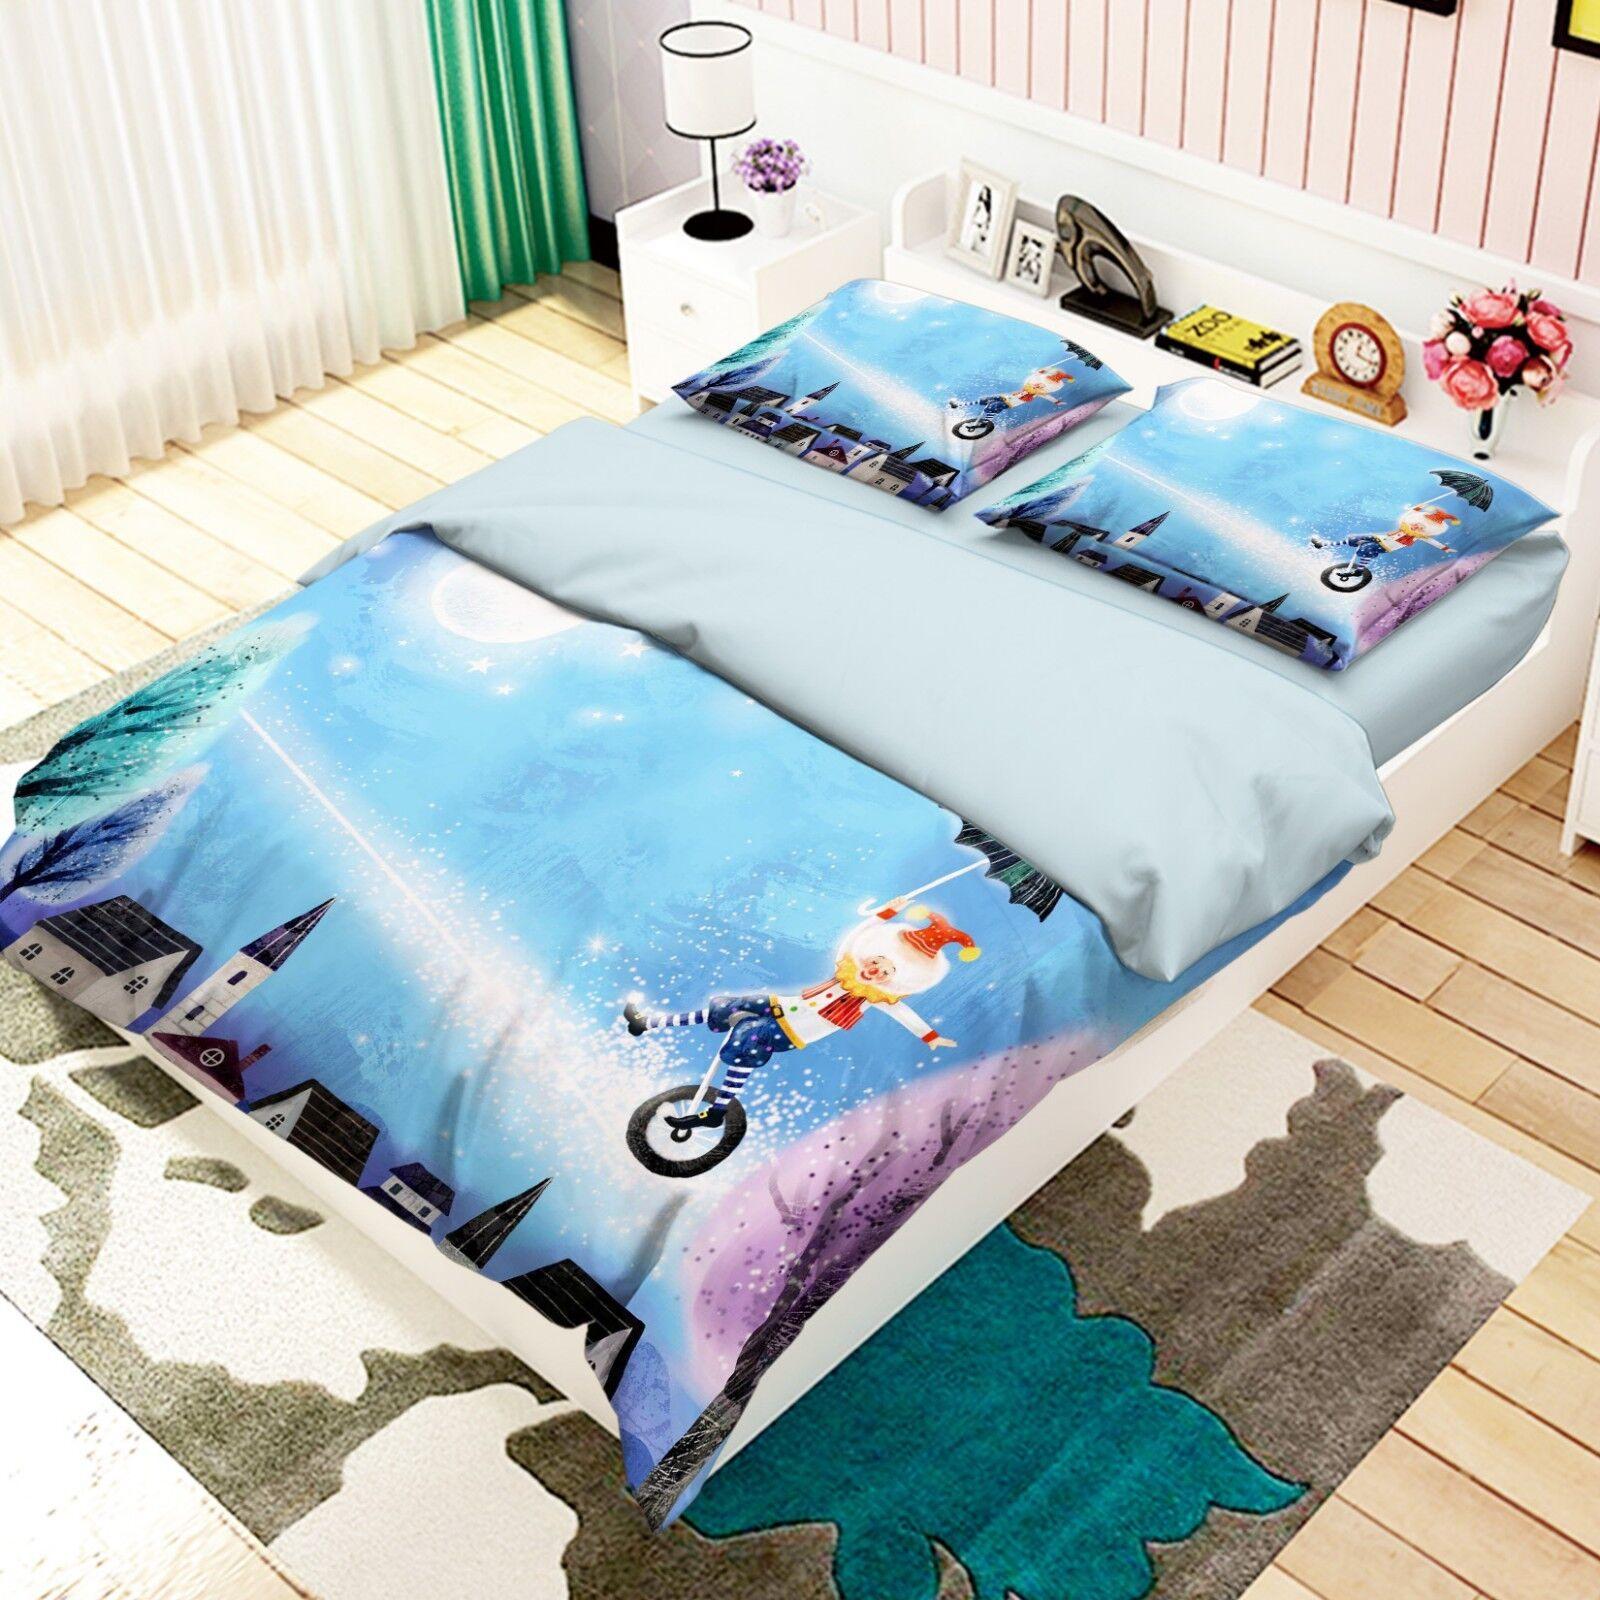 3D Snow House Boy 67 Bed Pillowcases Quilt Duvet Cover Set Single Queen AU Carly